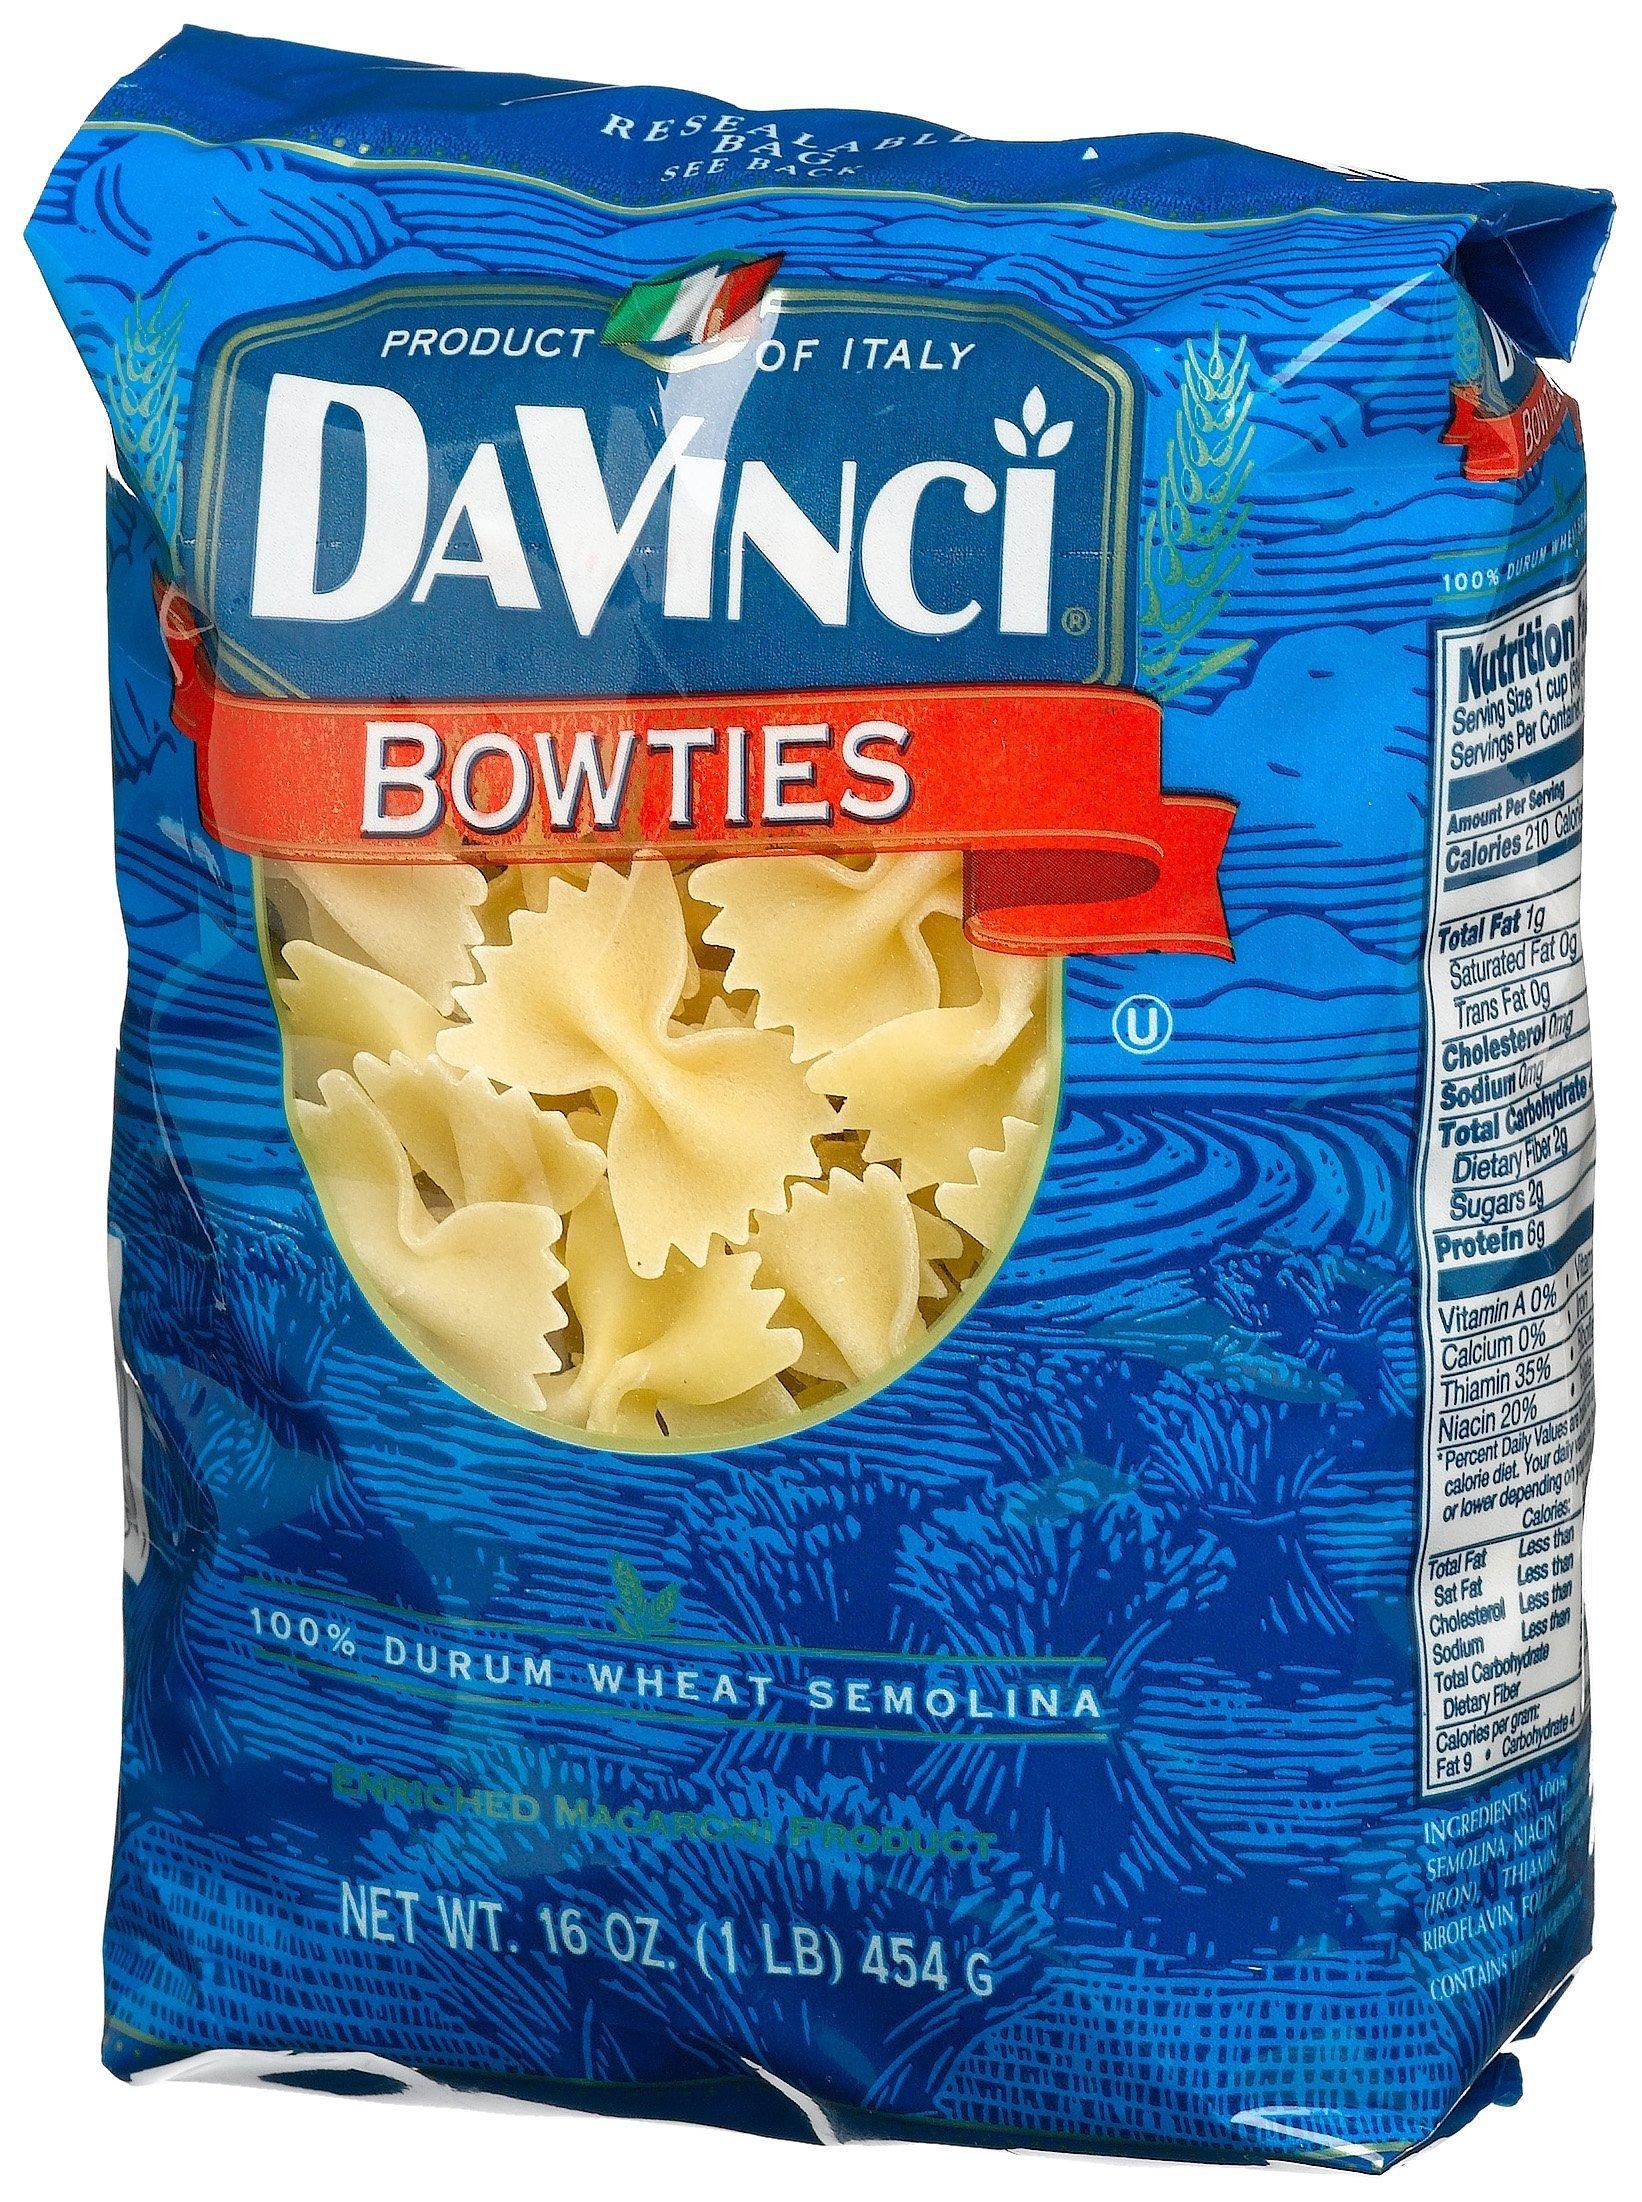 DaVinci Bowties Pasta, 16-Ounces (Pack of 12)